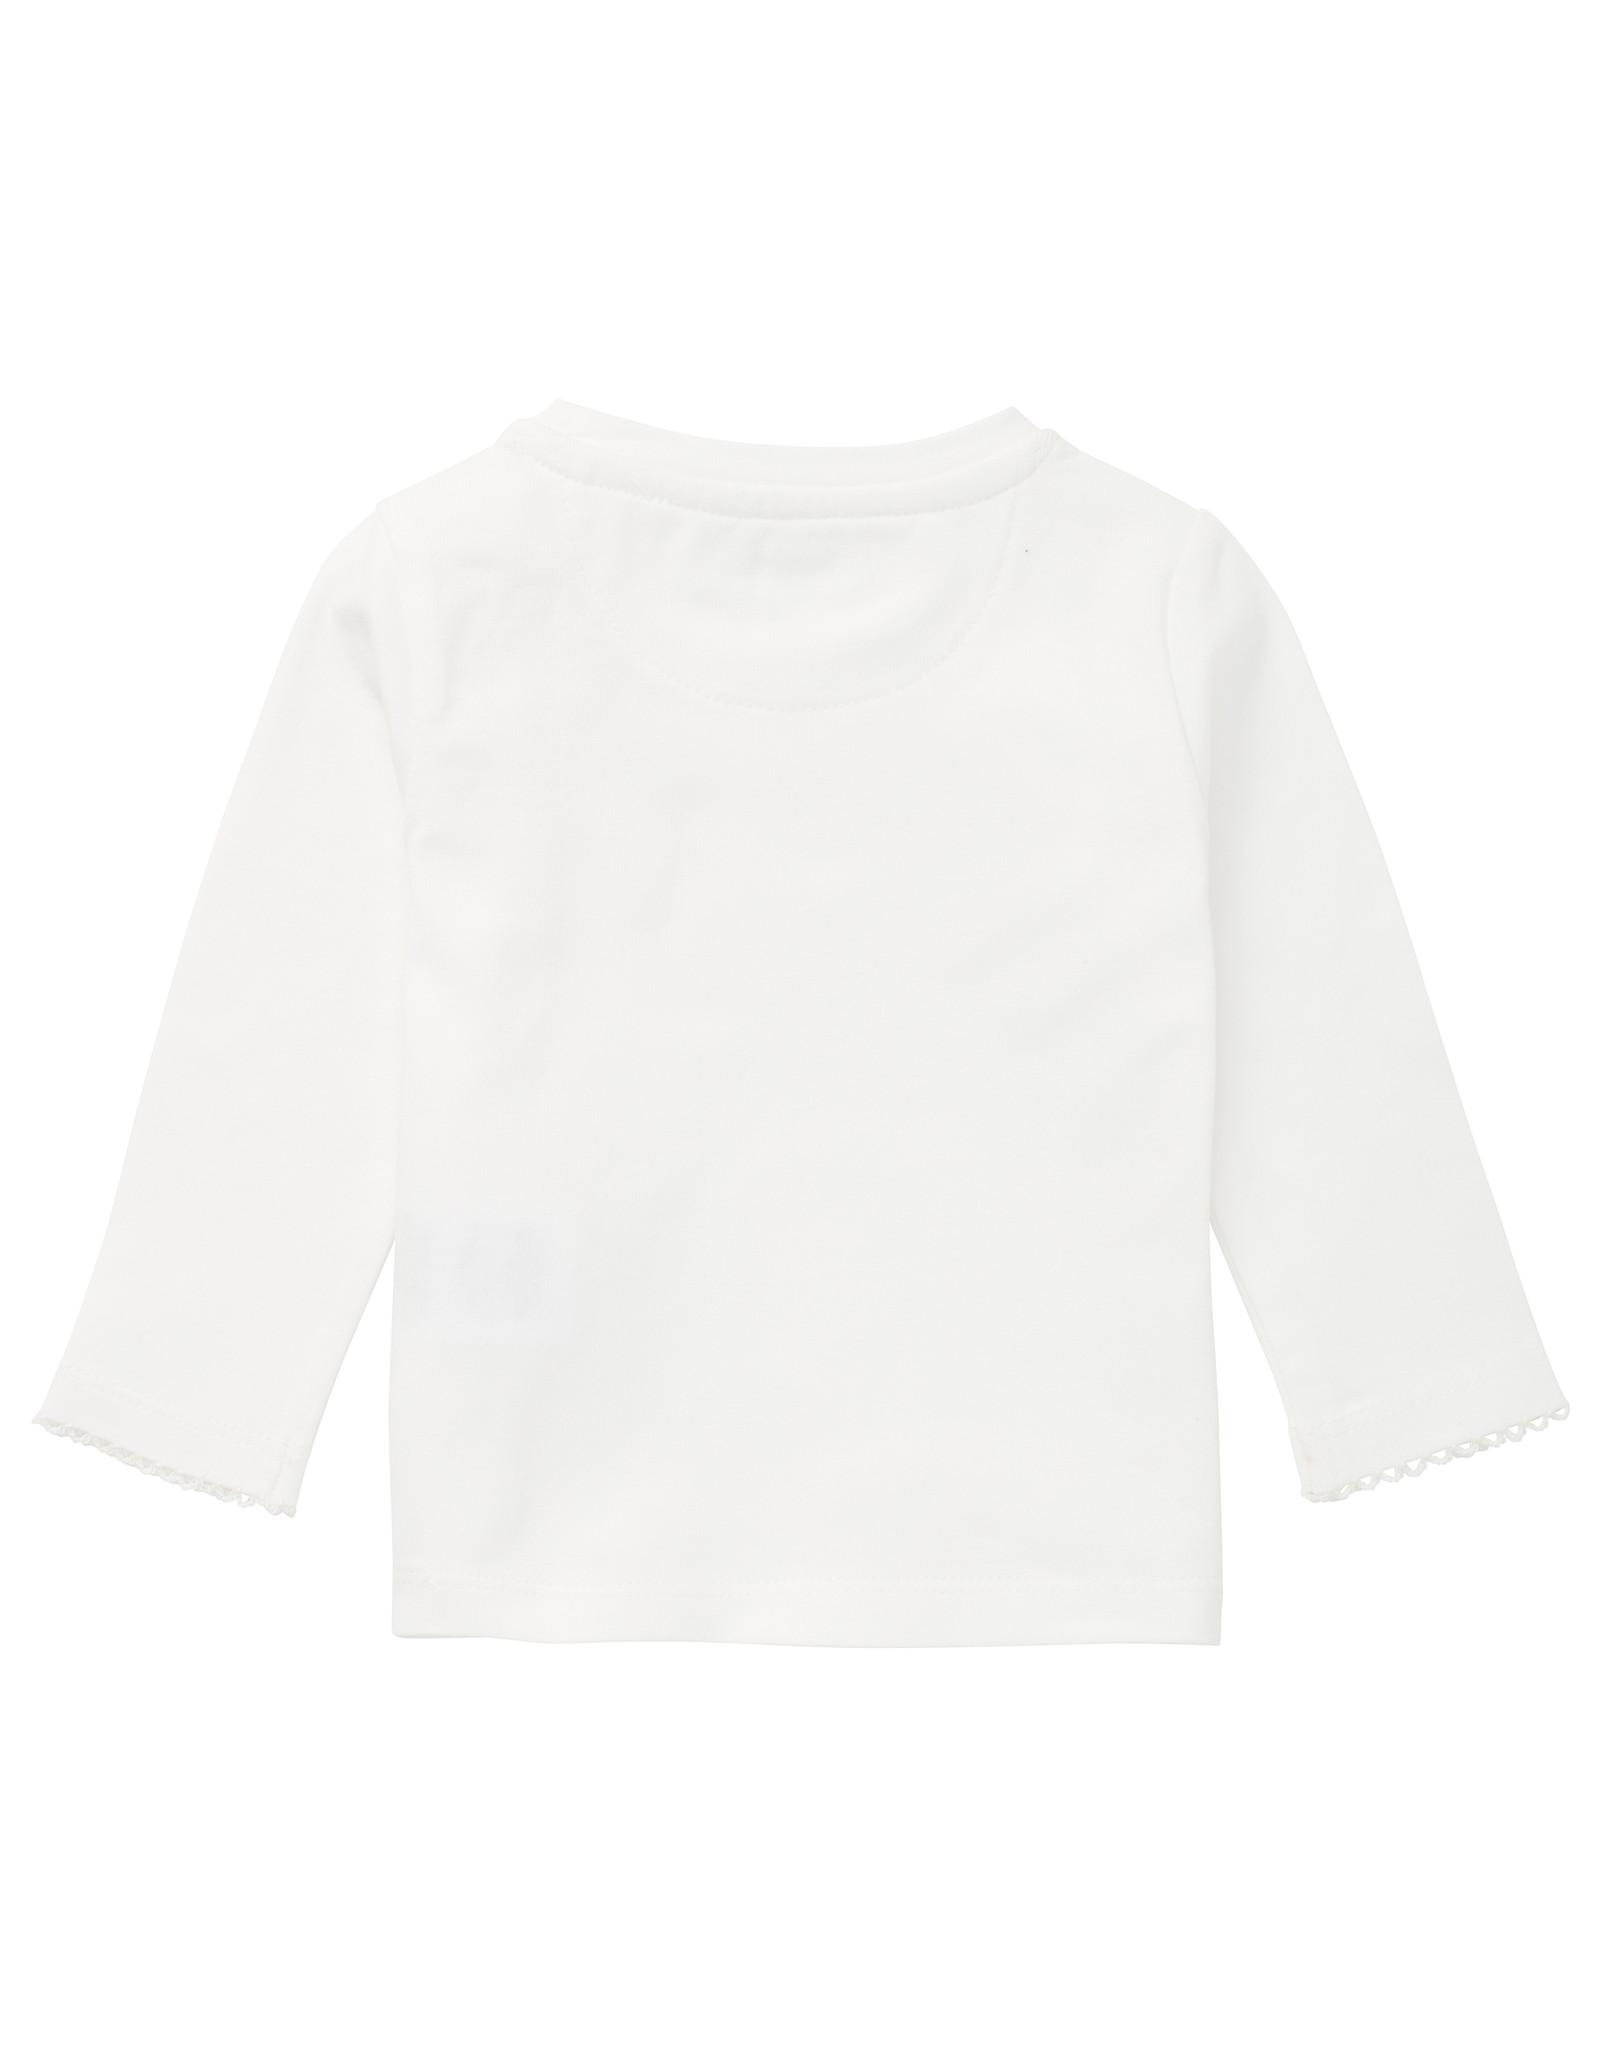 Noppies G T-shirt LS Moosomin, Snow White